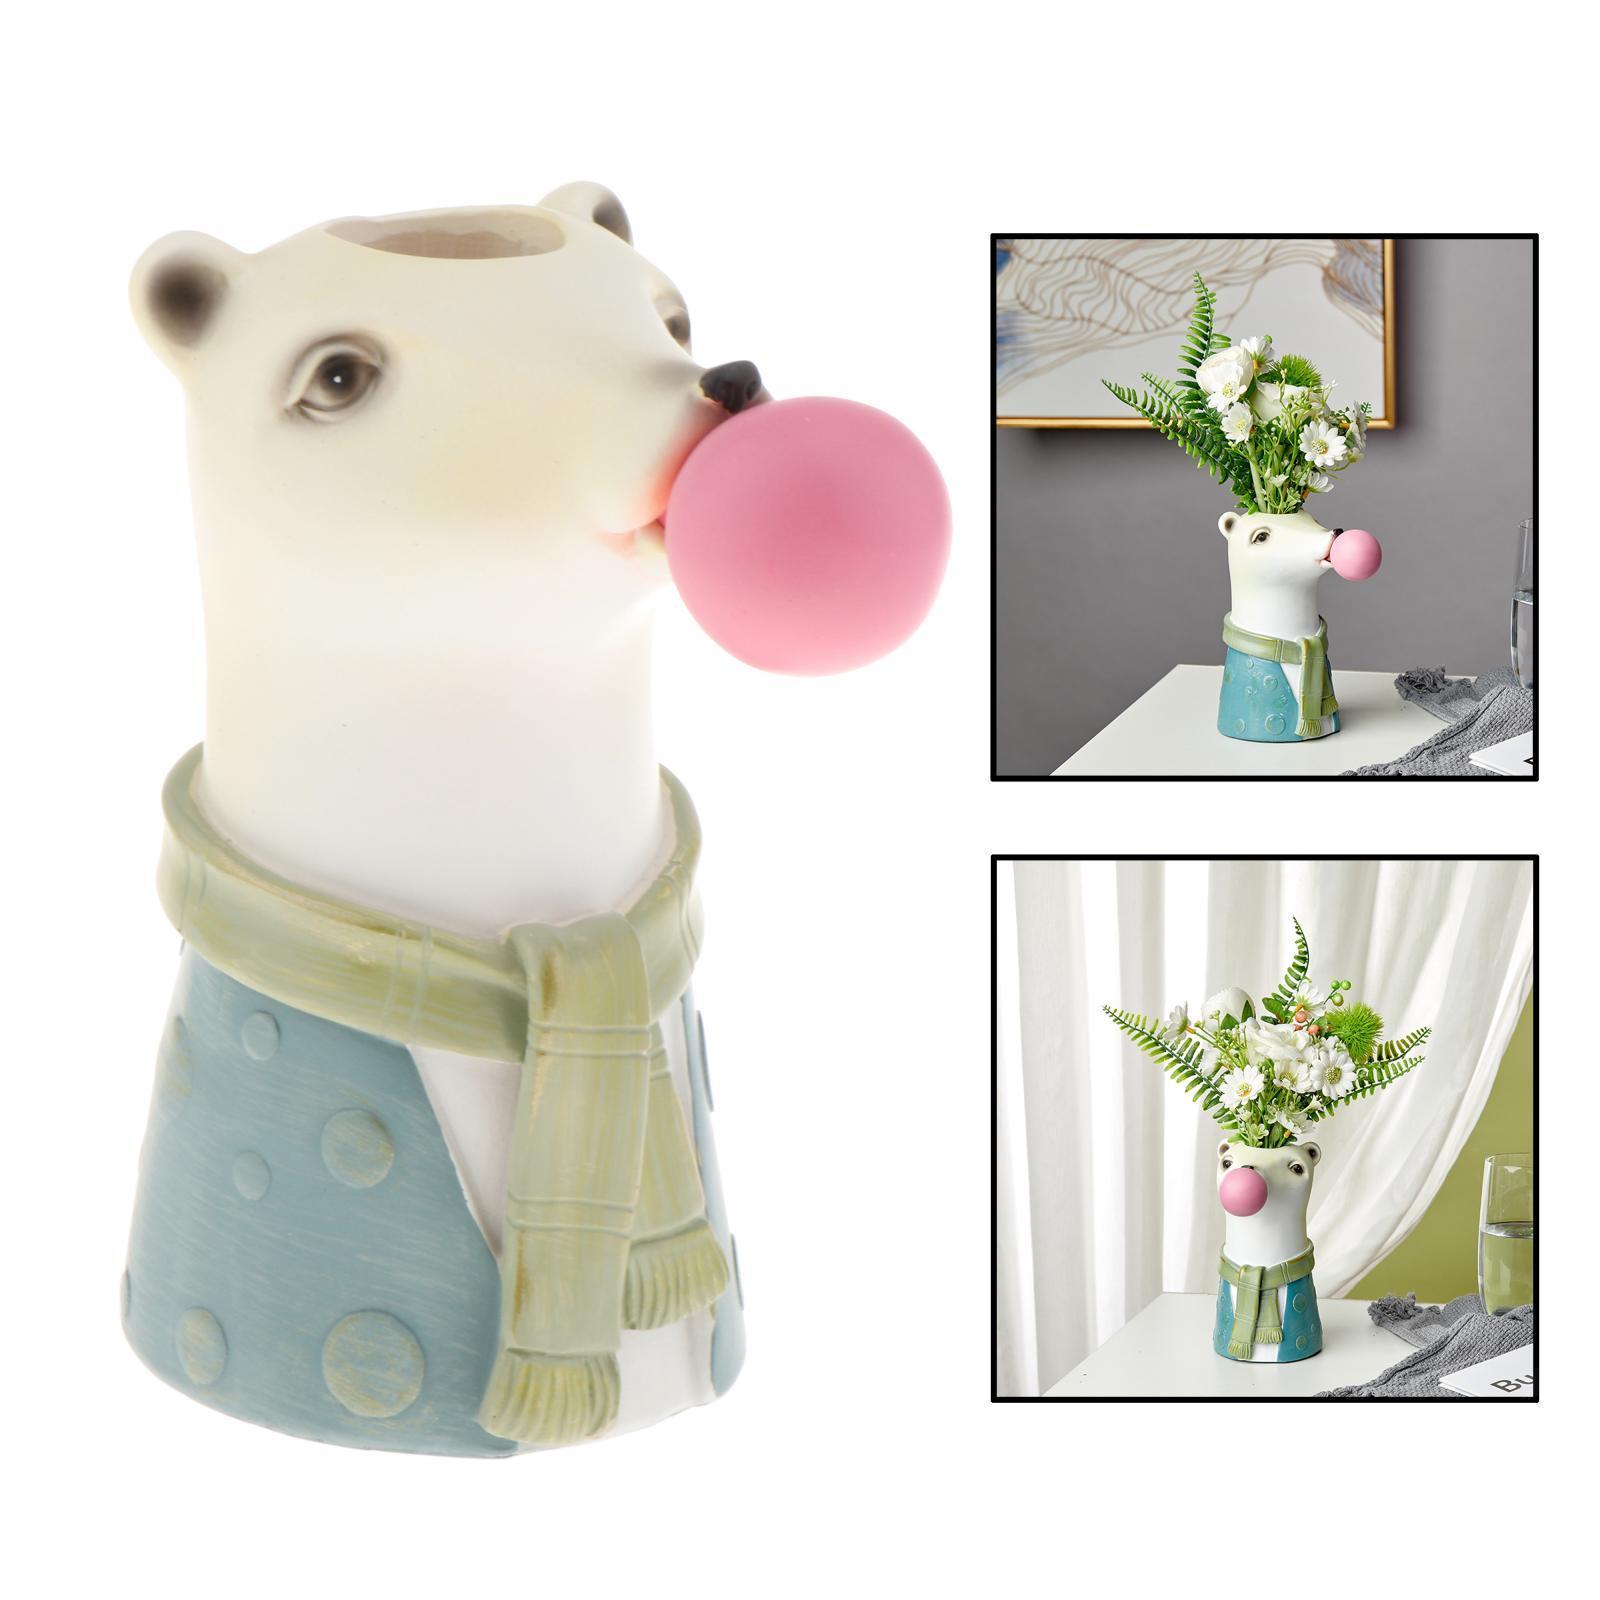 Indexbild 10 - Harz Tierkopf Trockenblume Vase Pflanzer Topf Home Office Bar Desktop Ornament